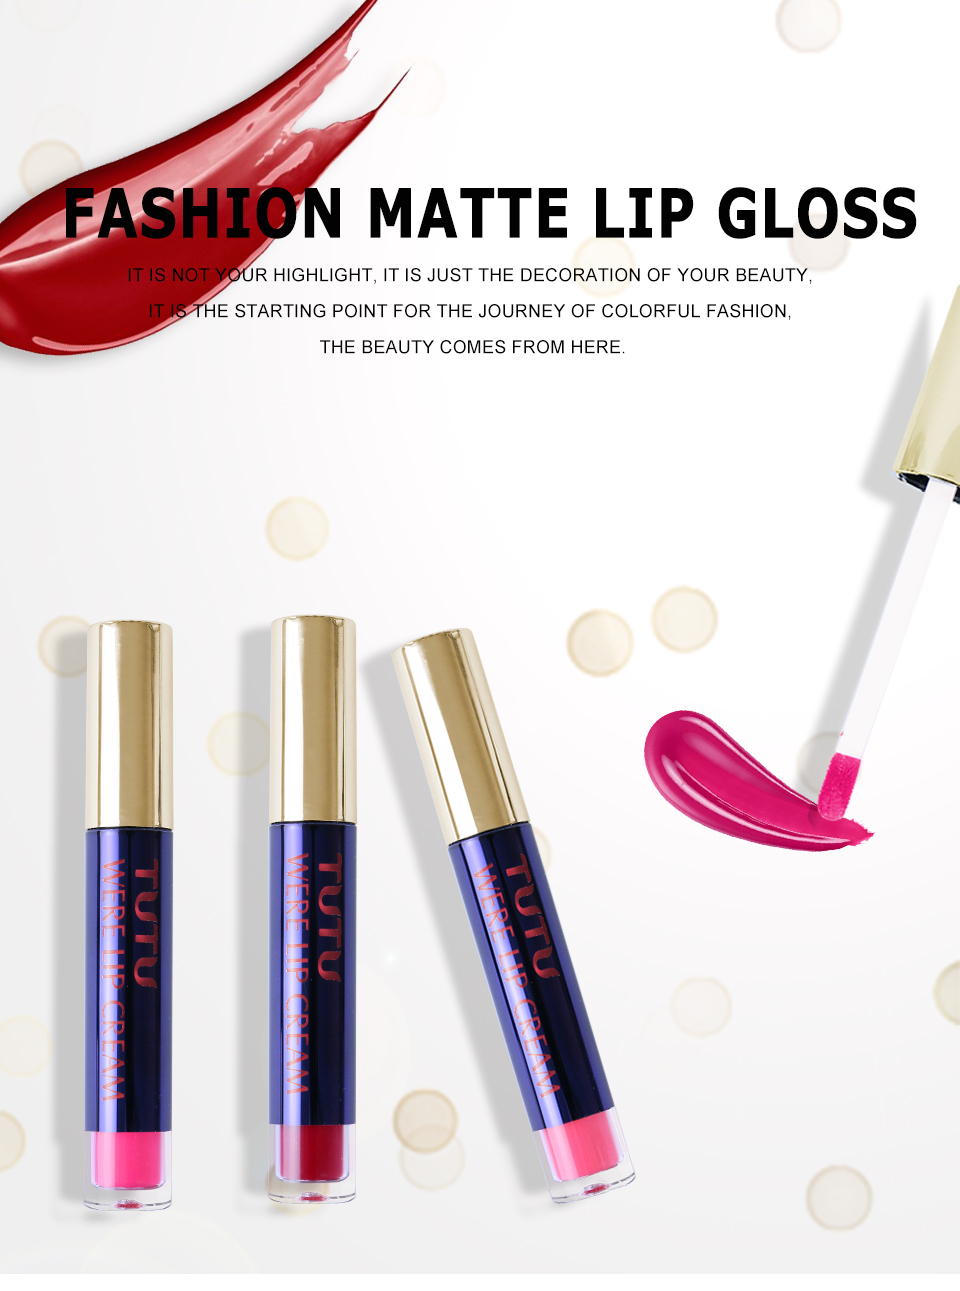 Professional Lip Makeup Matte Lip Gloss Velvet Red Lipstick Liquid Tint Waterproof Moisturizer Full Color Lip Gloss Set Make up 7